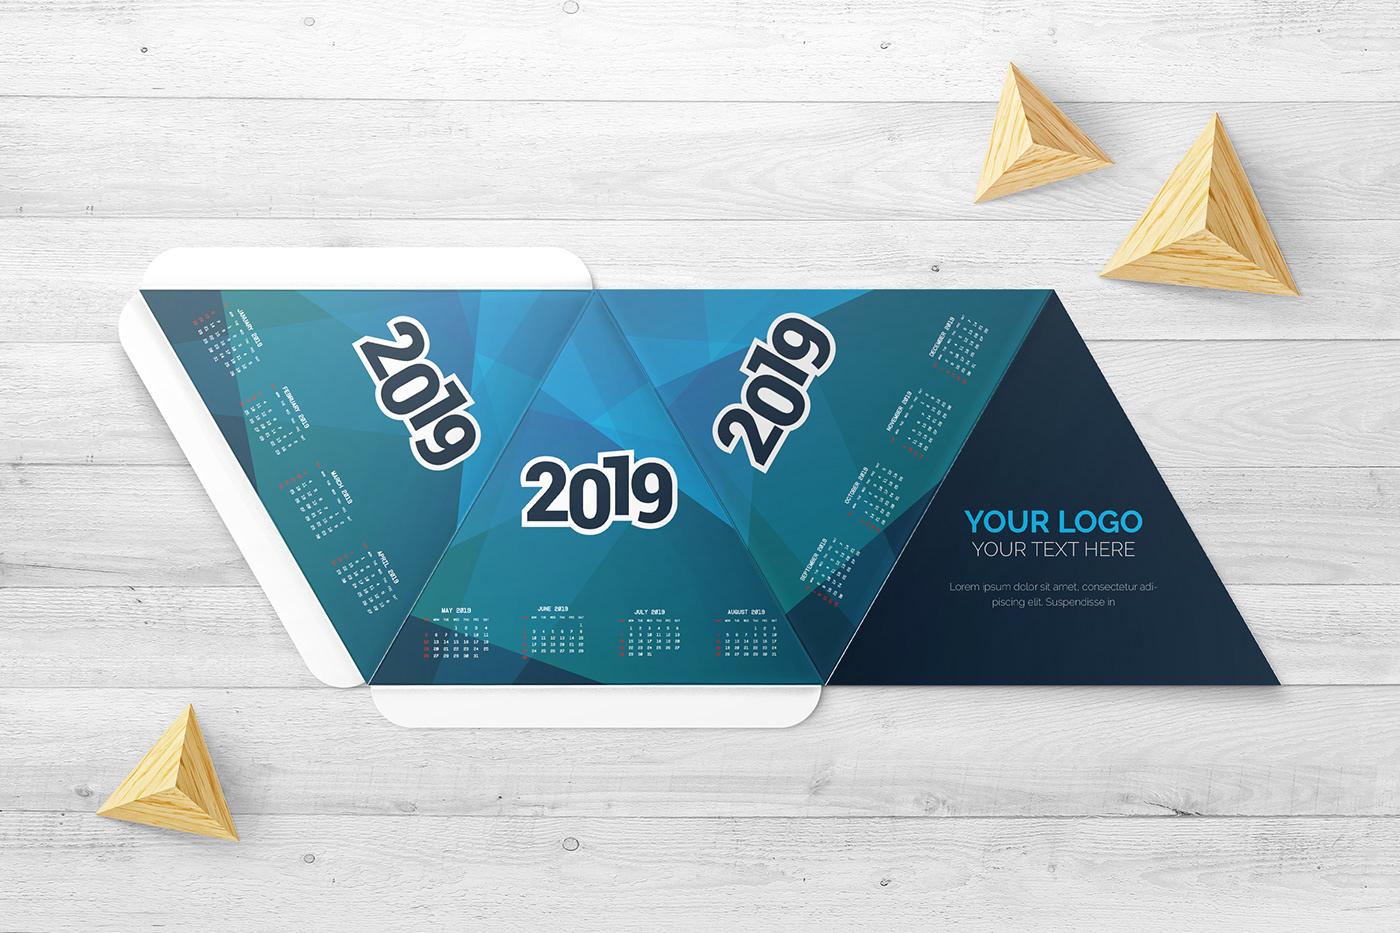 2019 design,calendar design idea,calendar 2019,Asm Arif,Design Inspiration,calendar design inspiration,2019 calendar